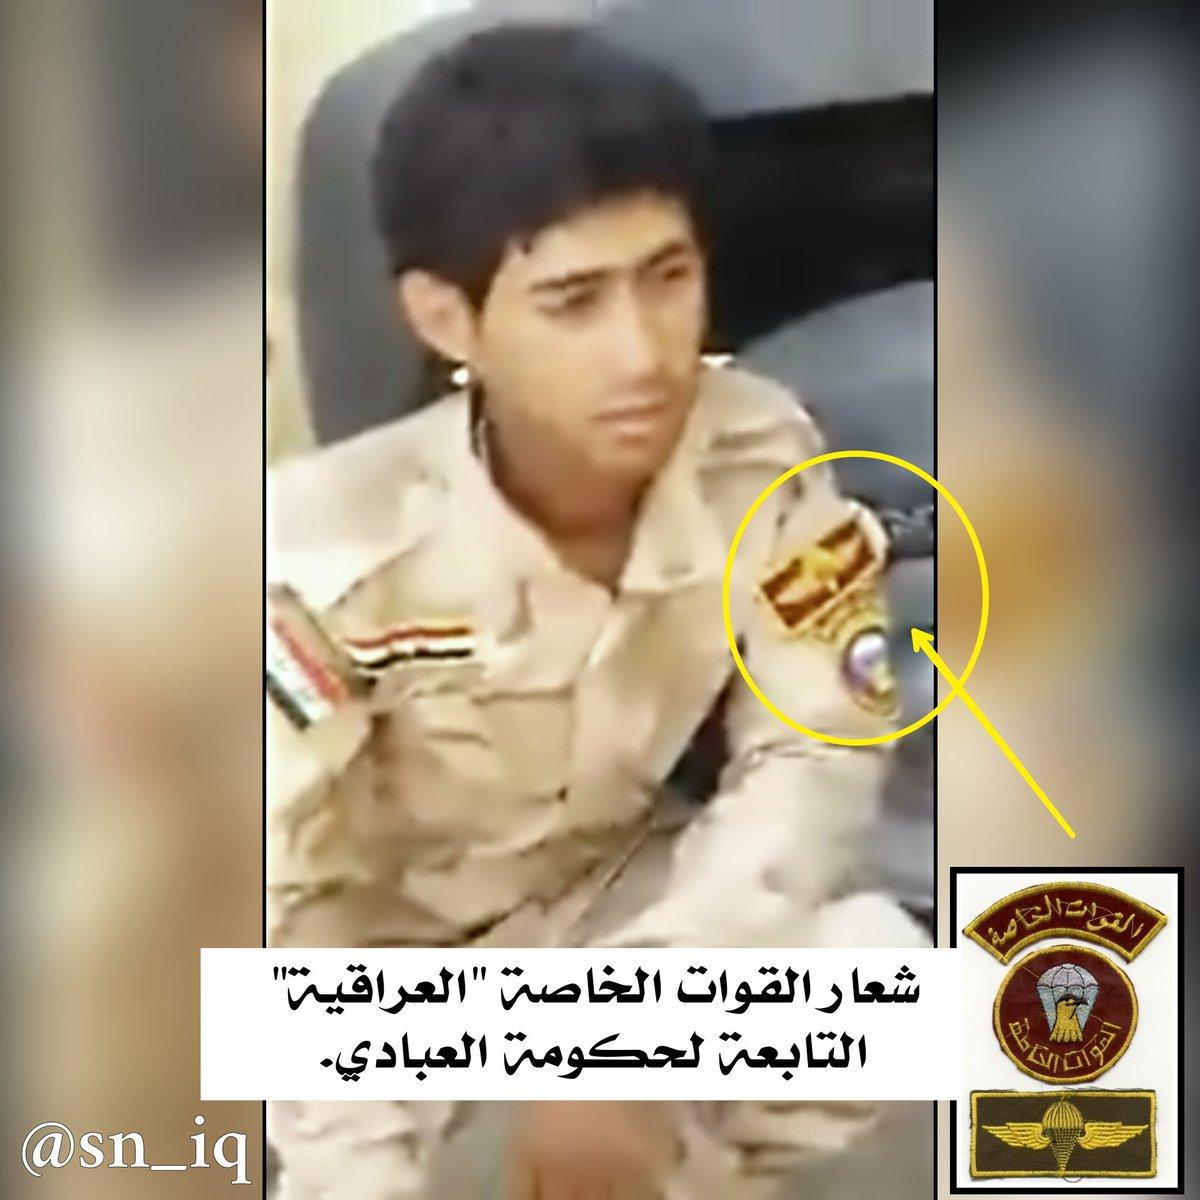 Iraq information I NEED HELP?